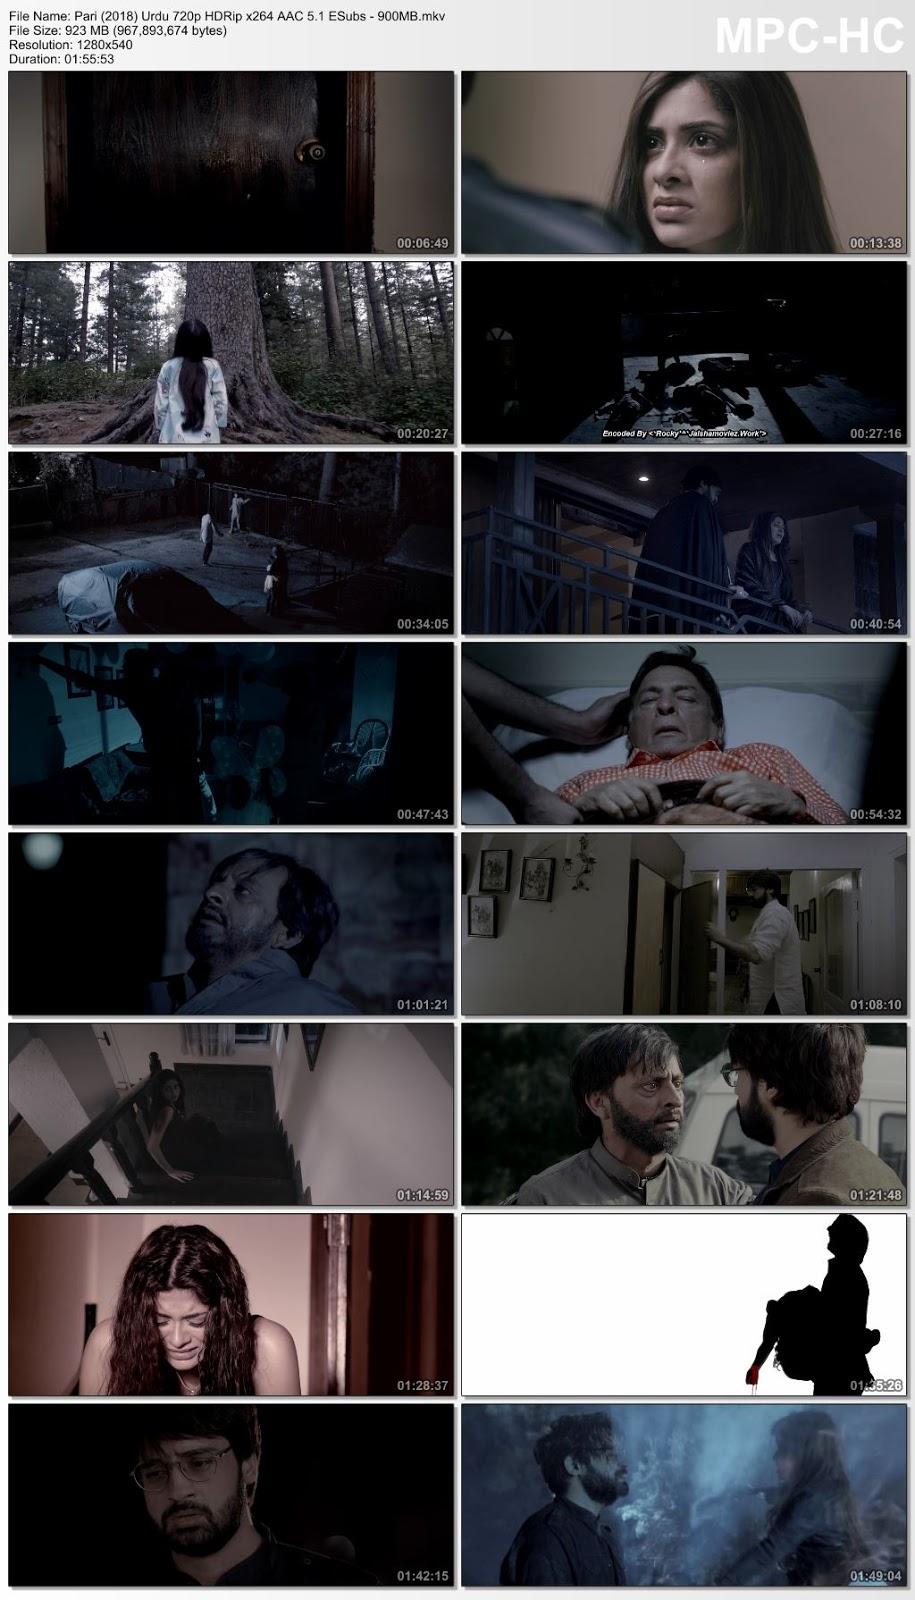 Pari (2018) Urdu 720p HDRip x264 AAC 5.1 ESubs – 900MB Desirehub